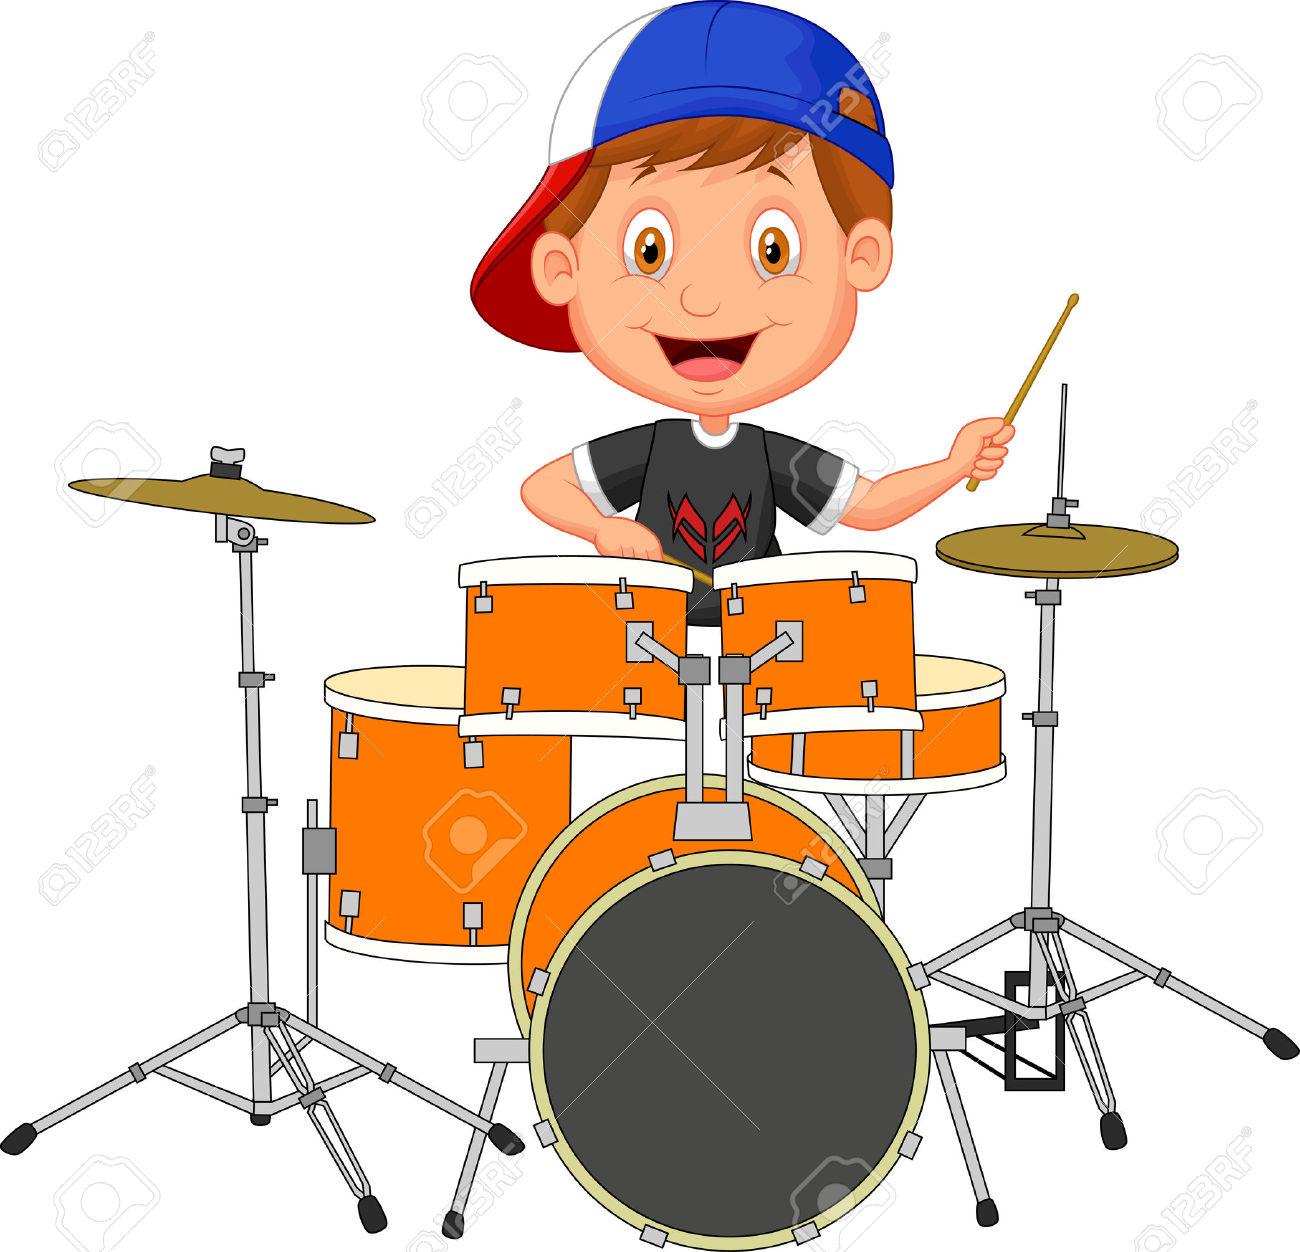 Drummer Clipart - Getbellhop-Drummer Clipart - Getbellhop-7